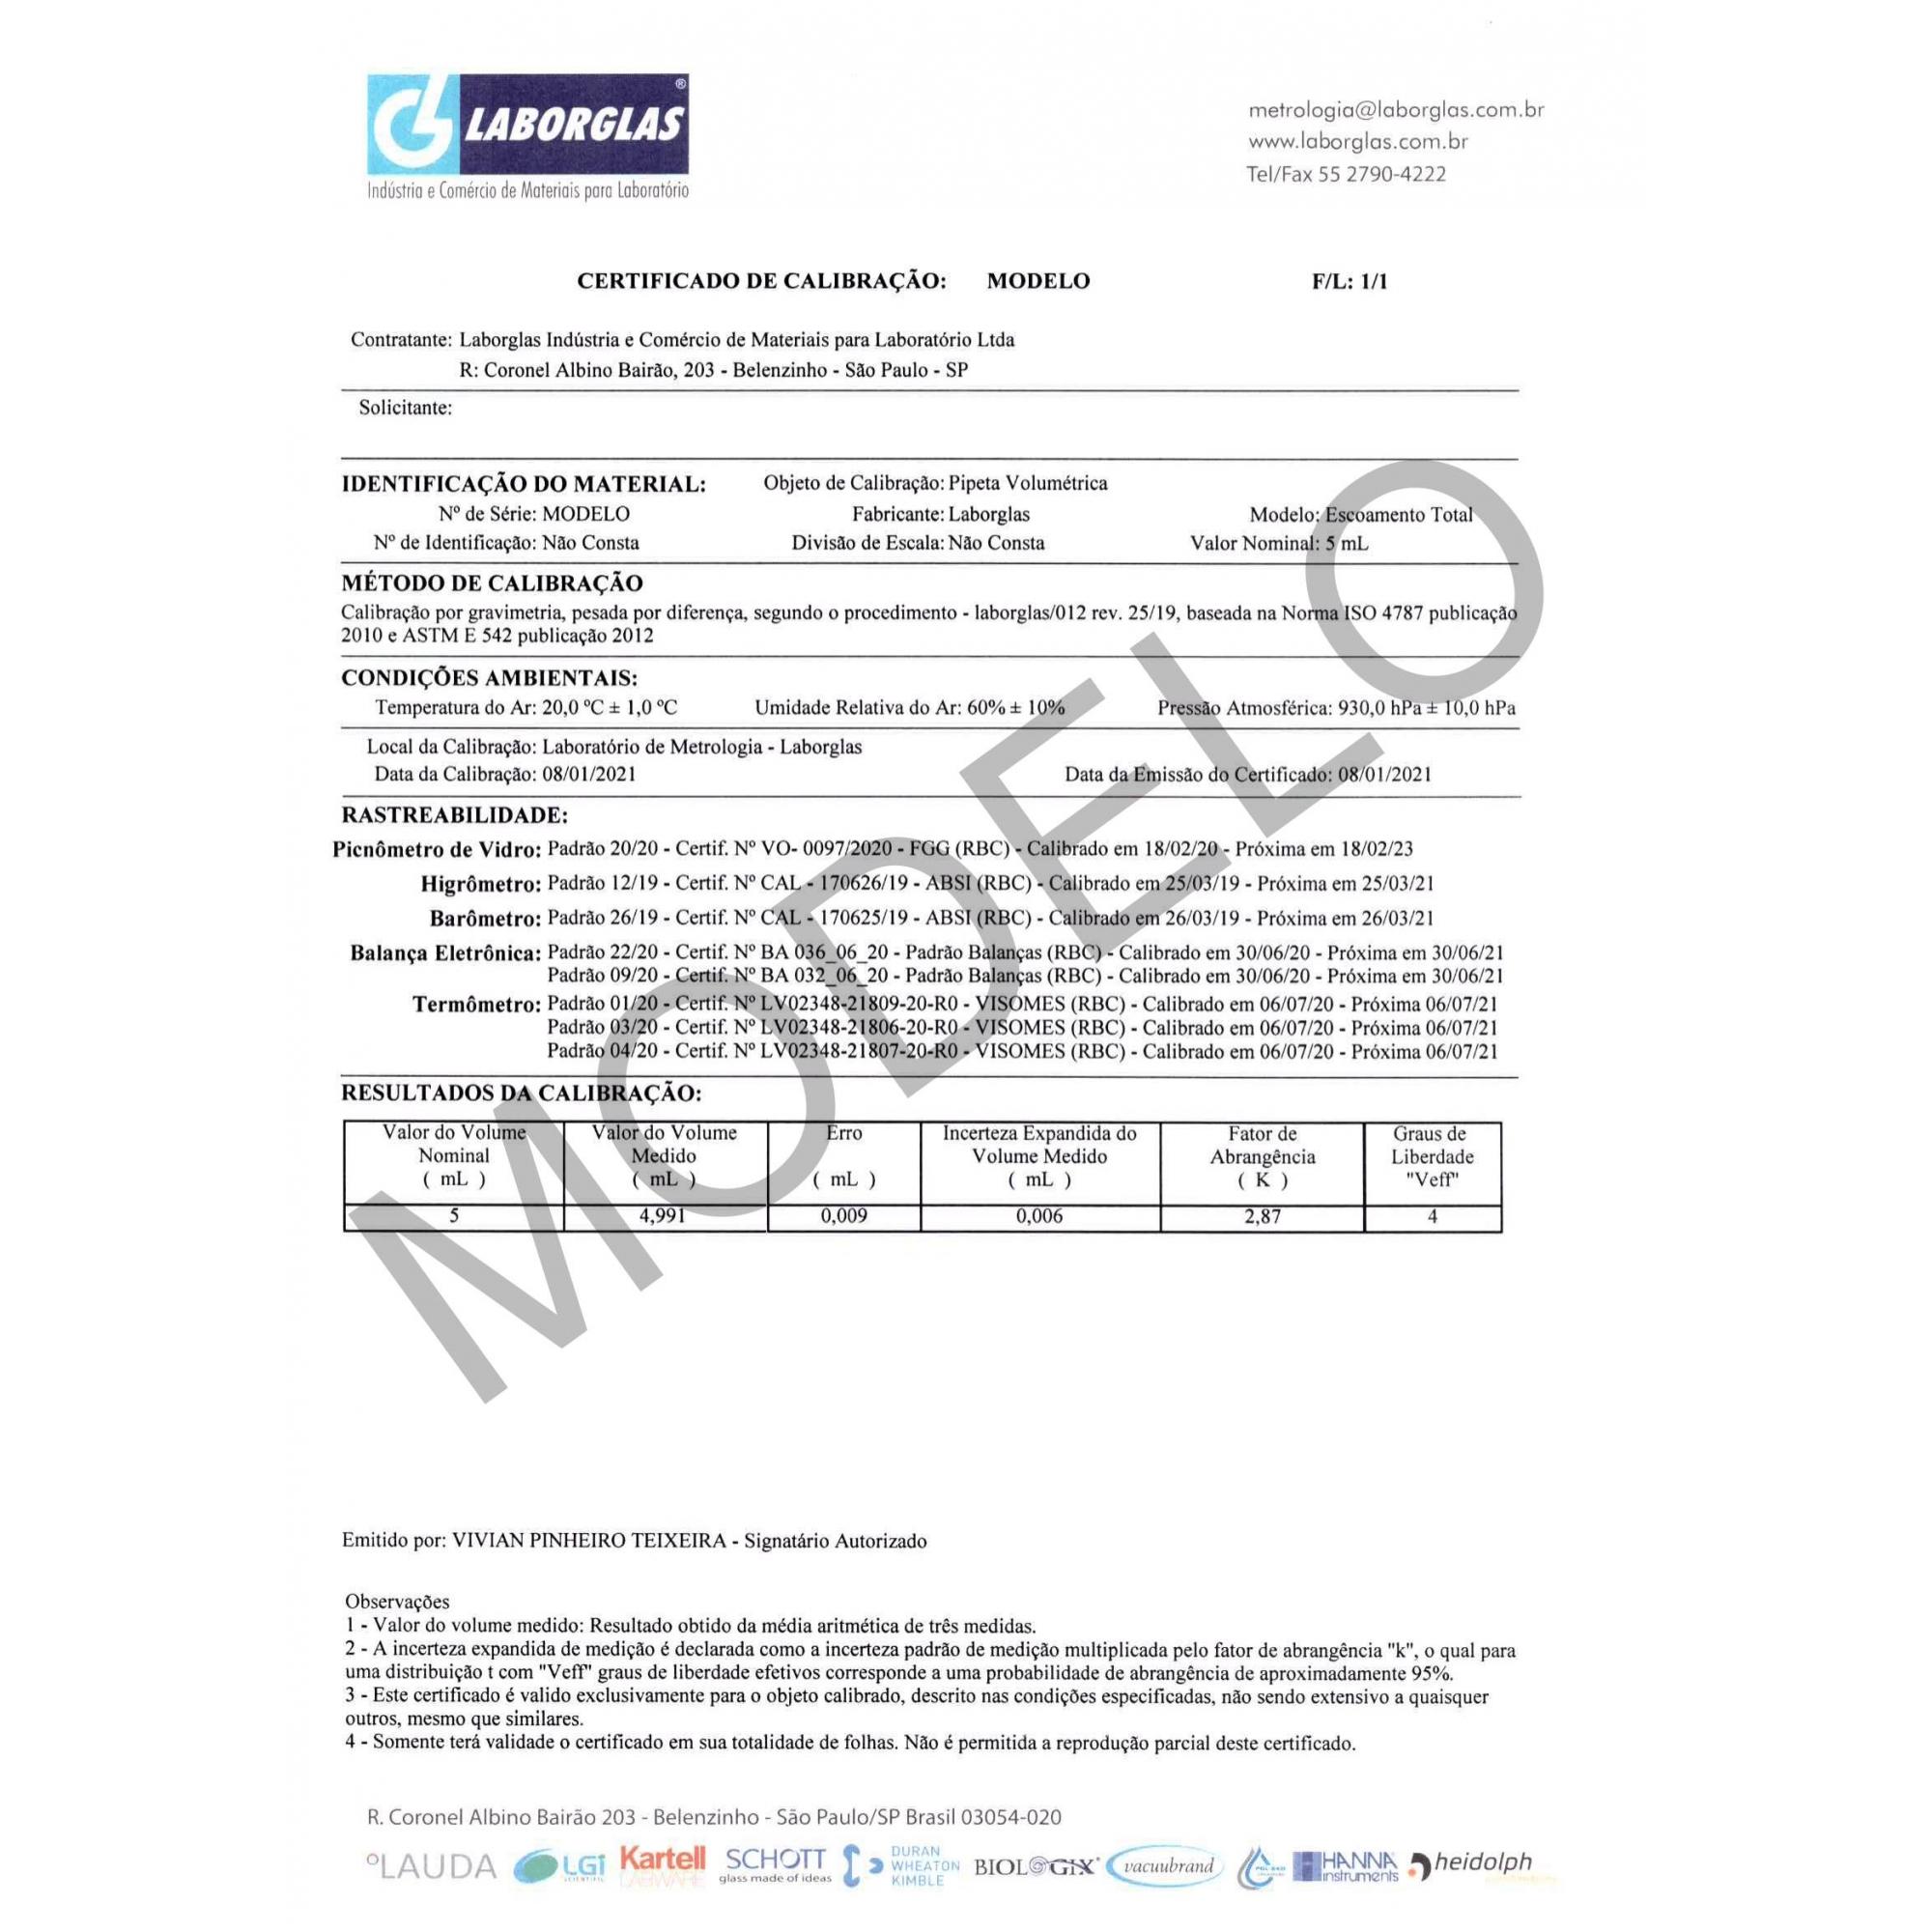 PIPETA VOLUMÉTRICA ESGOTAMENTO TOTAL CLASSE A  20 ML COM CERTIFICADO RASTREÁVEL - Laborglas - Cód. 9433814-C